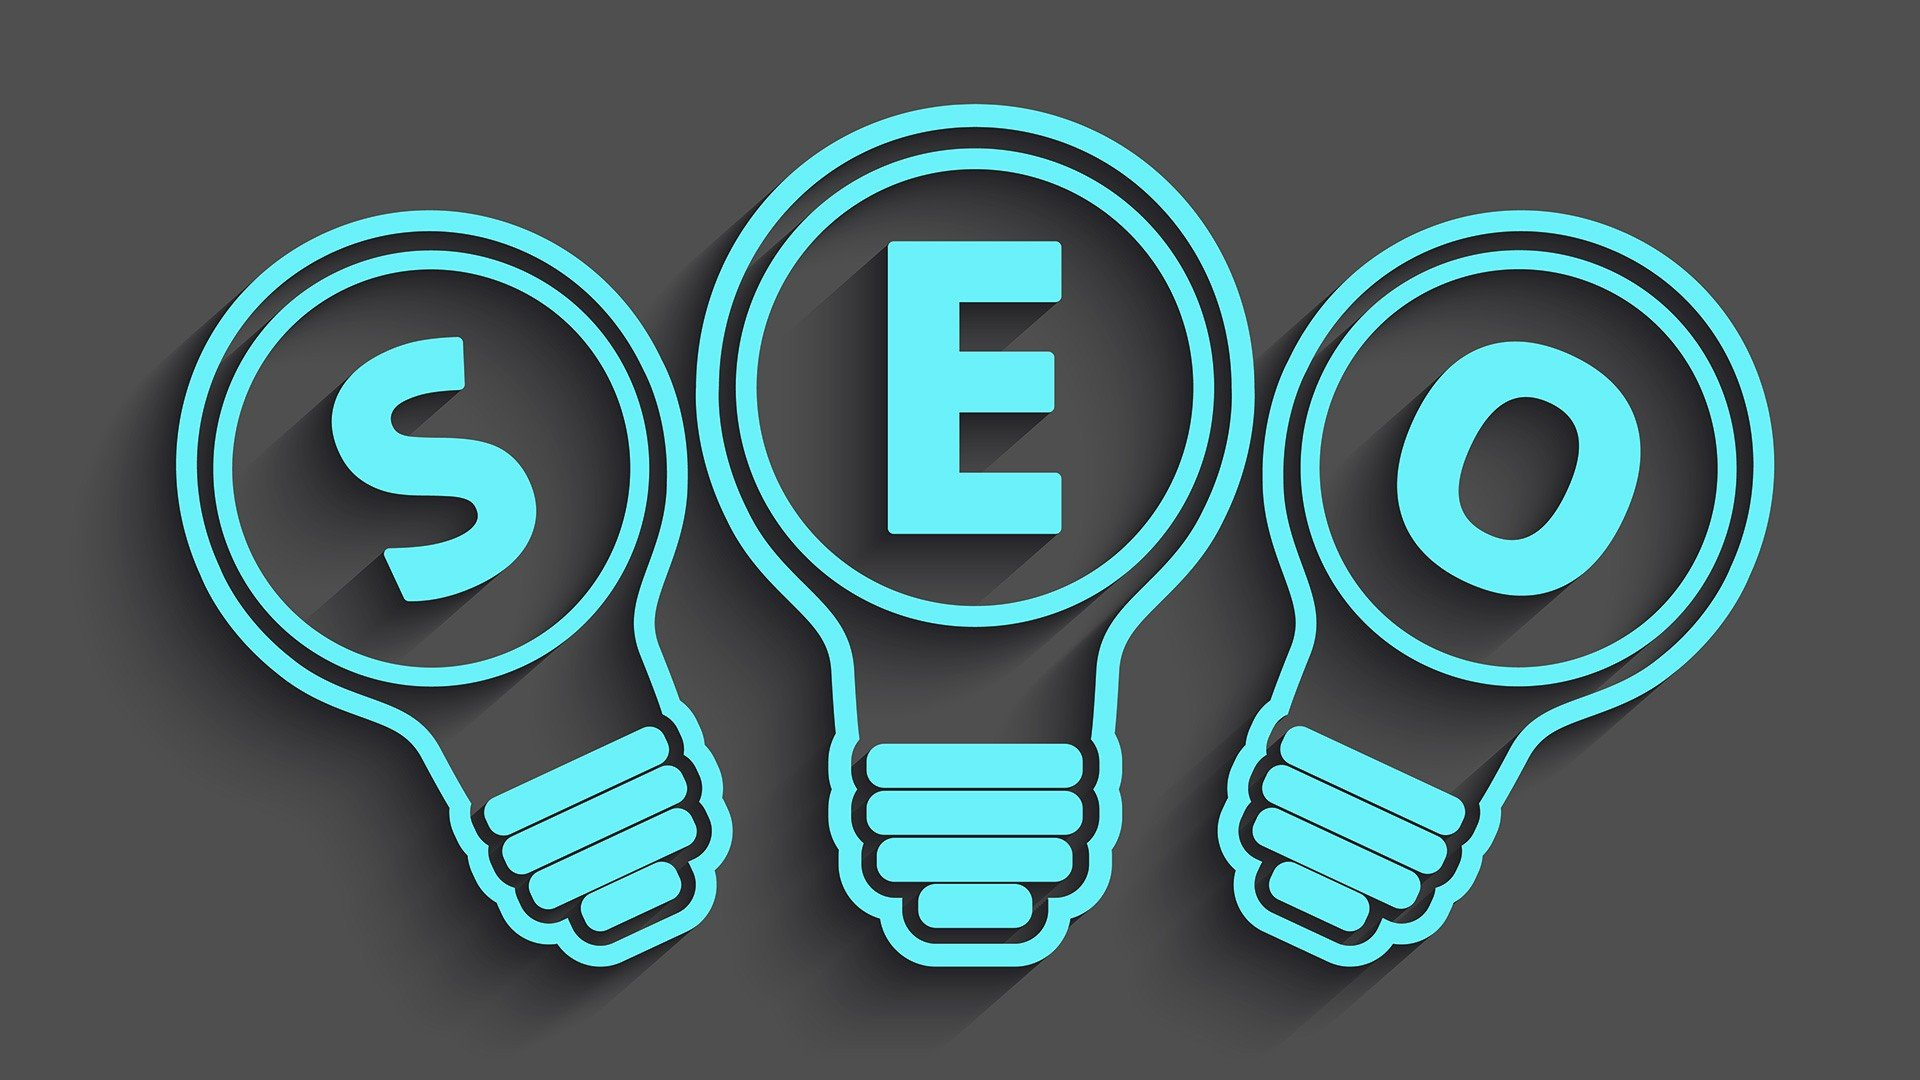 Blogging Talks - Coupon Codes, Discounts & Promo Codes